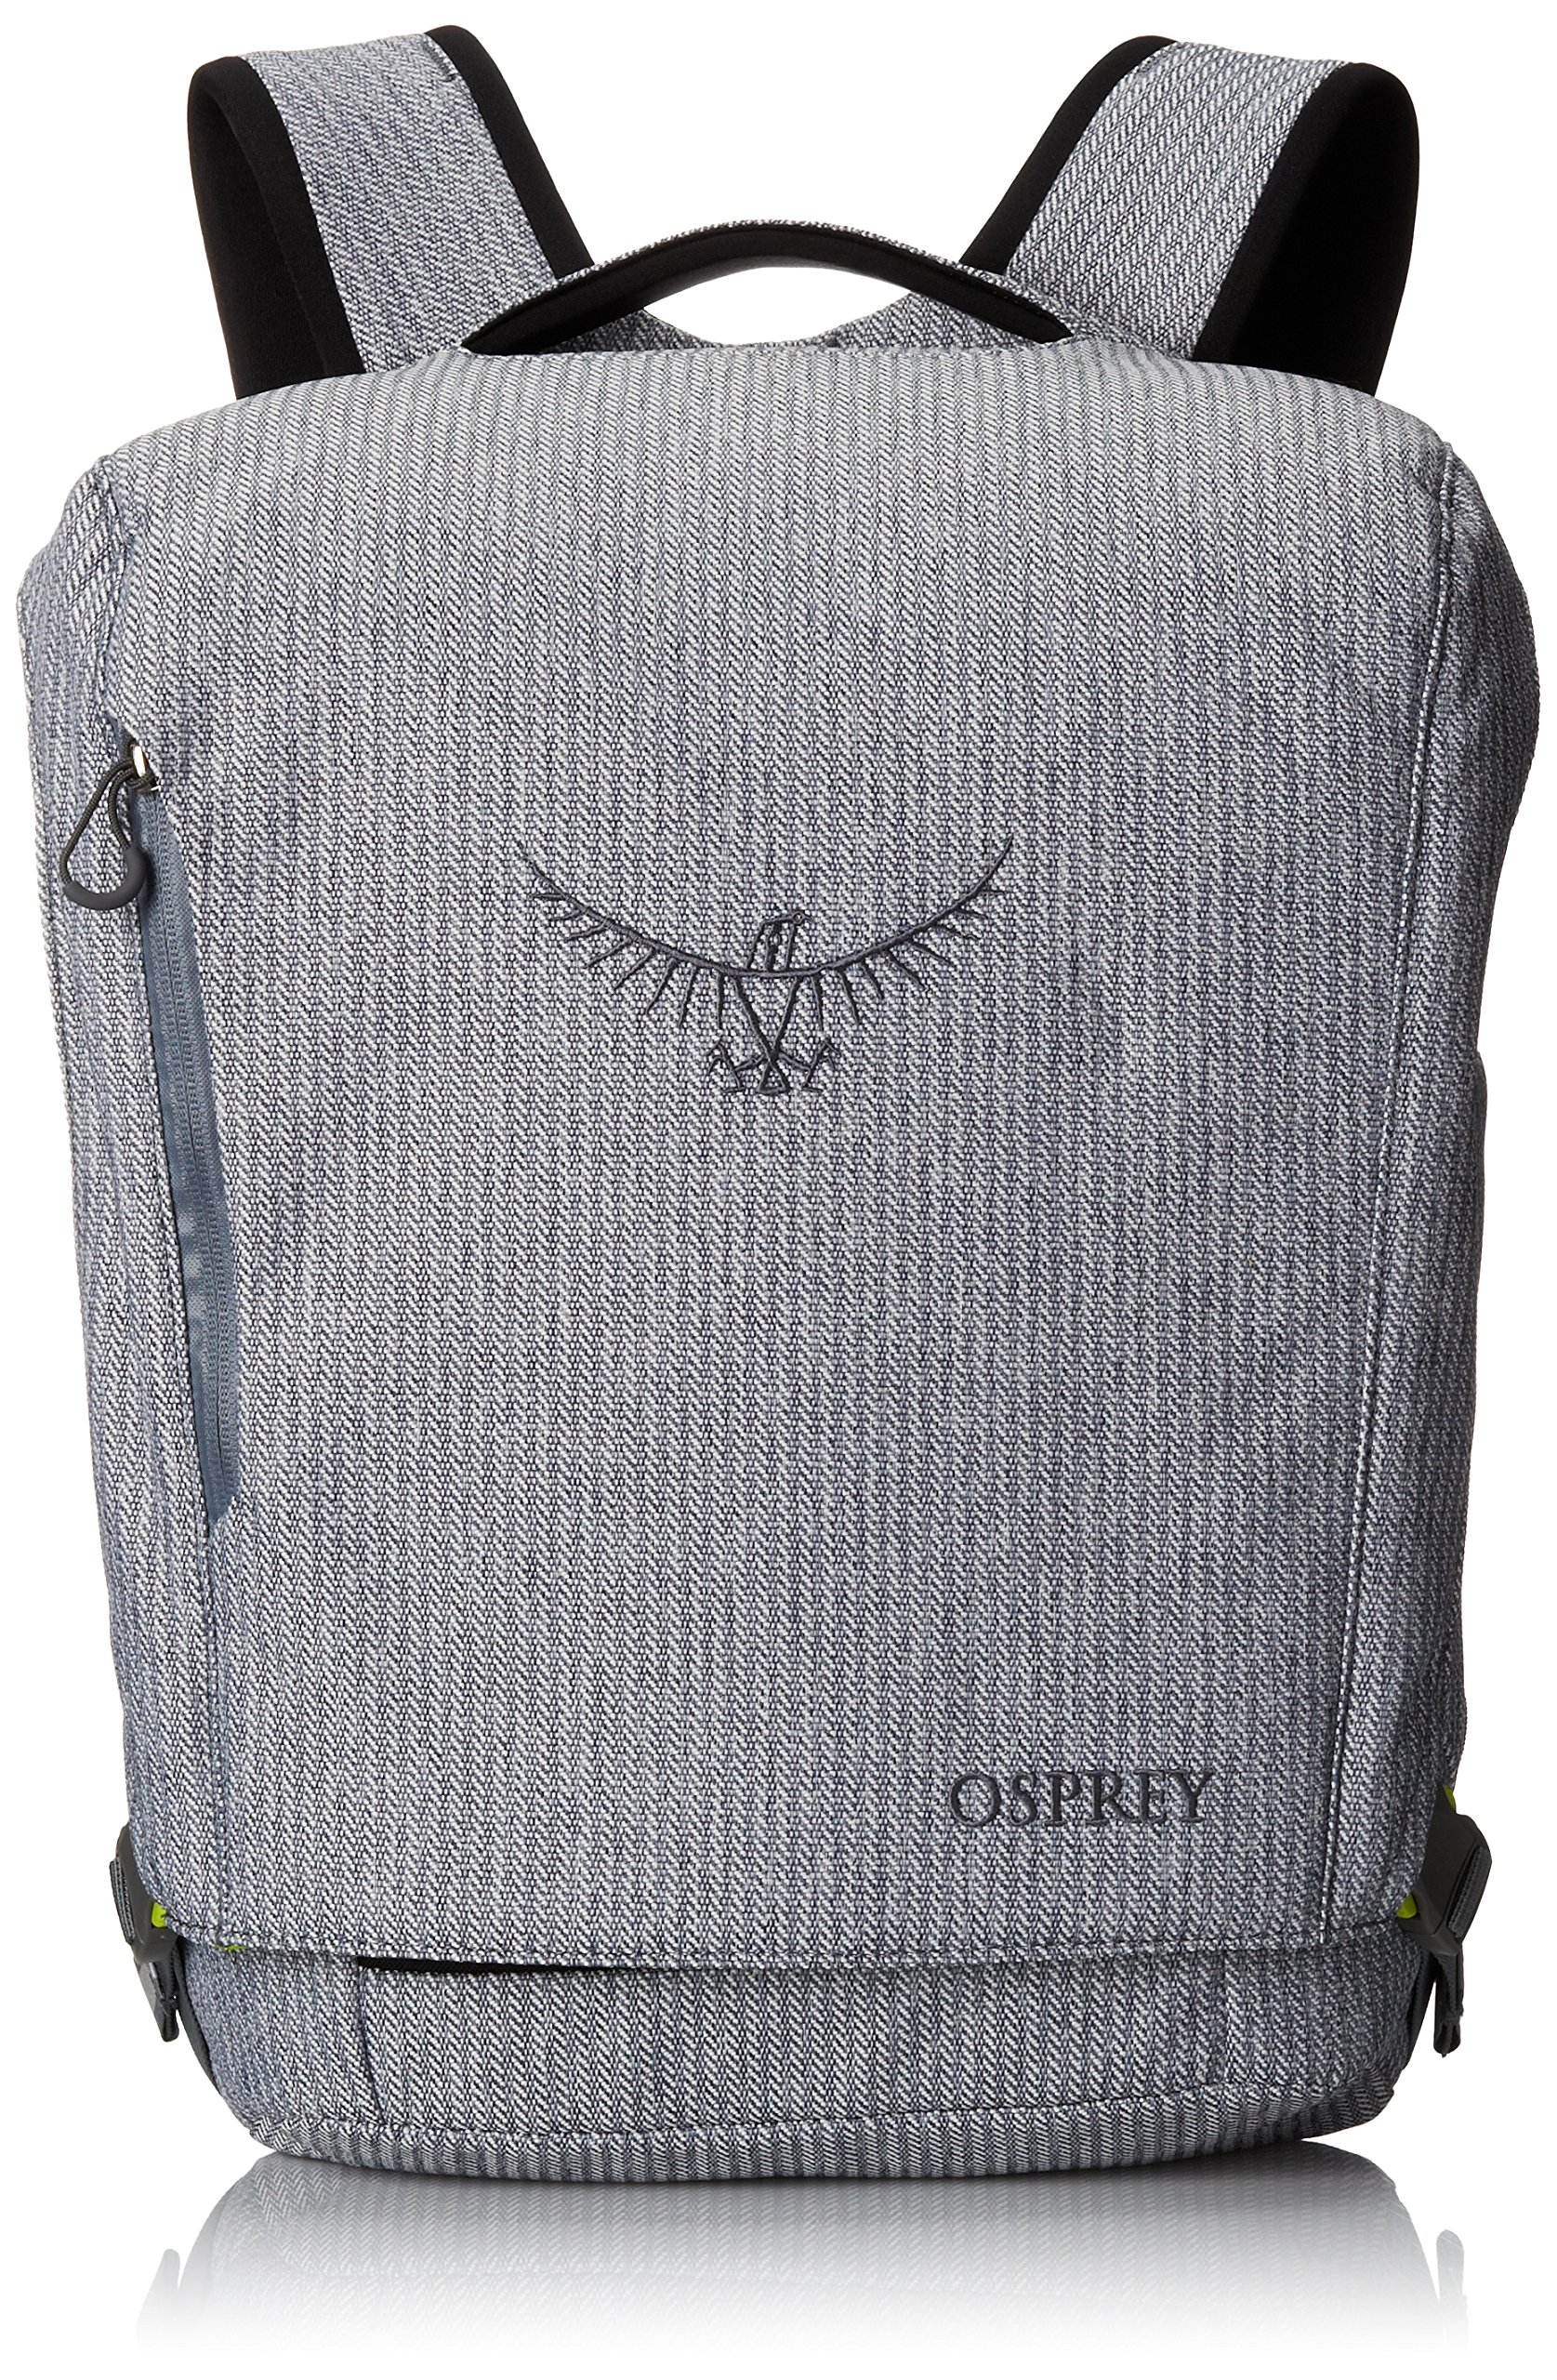 Osprey Packs Pixel Port Daypack (Spring 2016 Model), Grey Herringbone